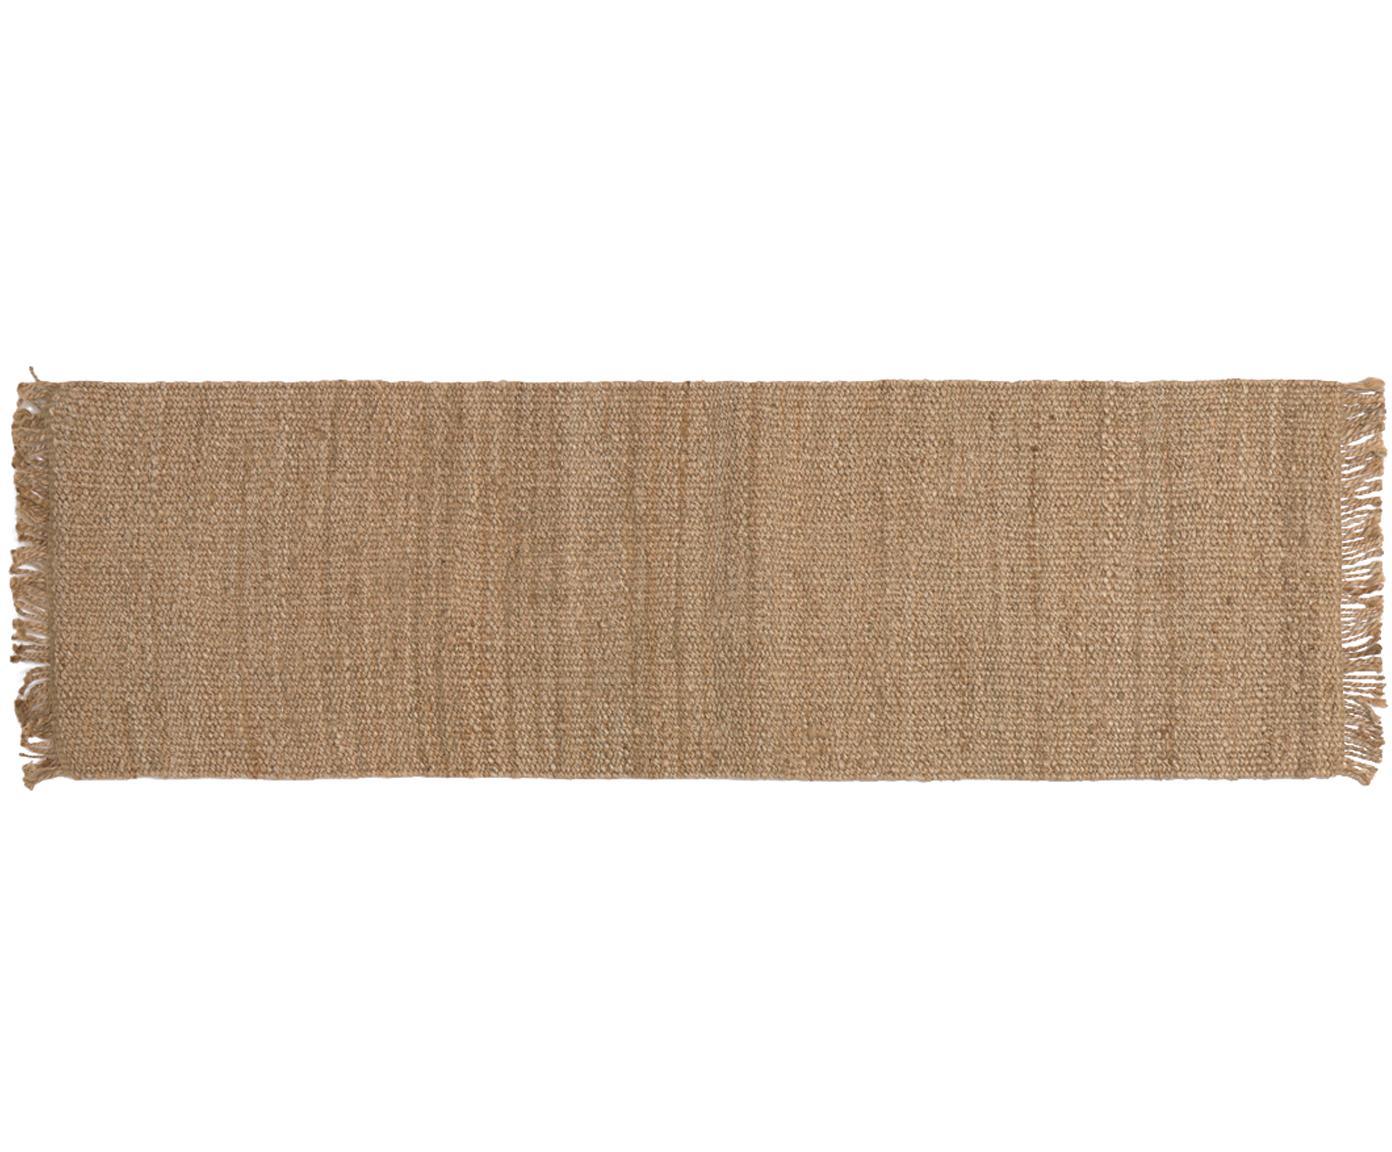 Handgefertigter Jute-Läufer Cadiz mit Fransen, 100% Jute, Jute, 70 x 240 cm